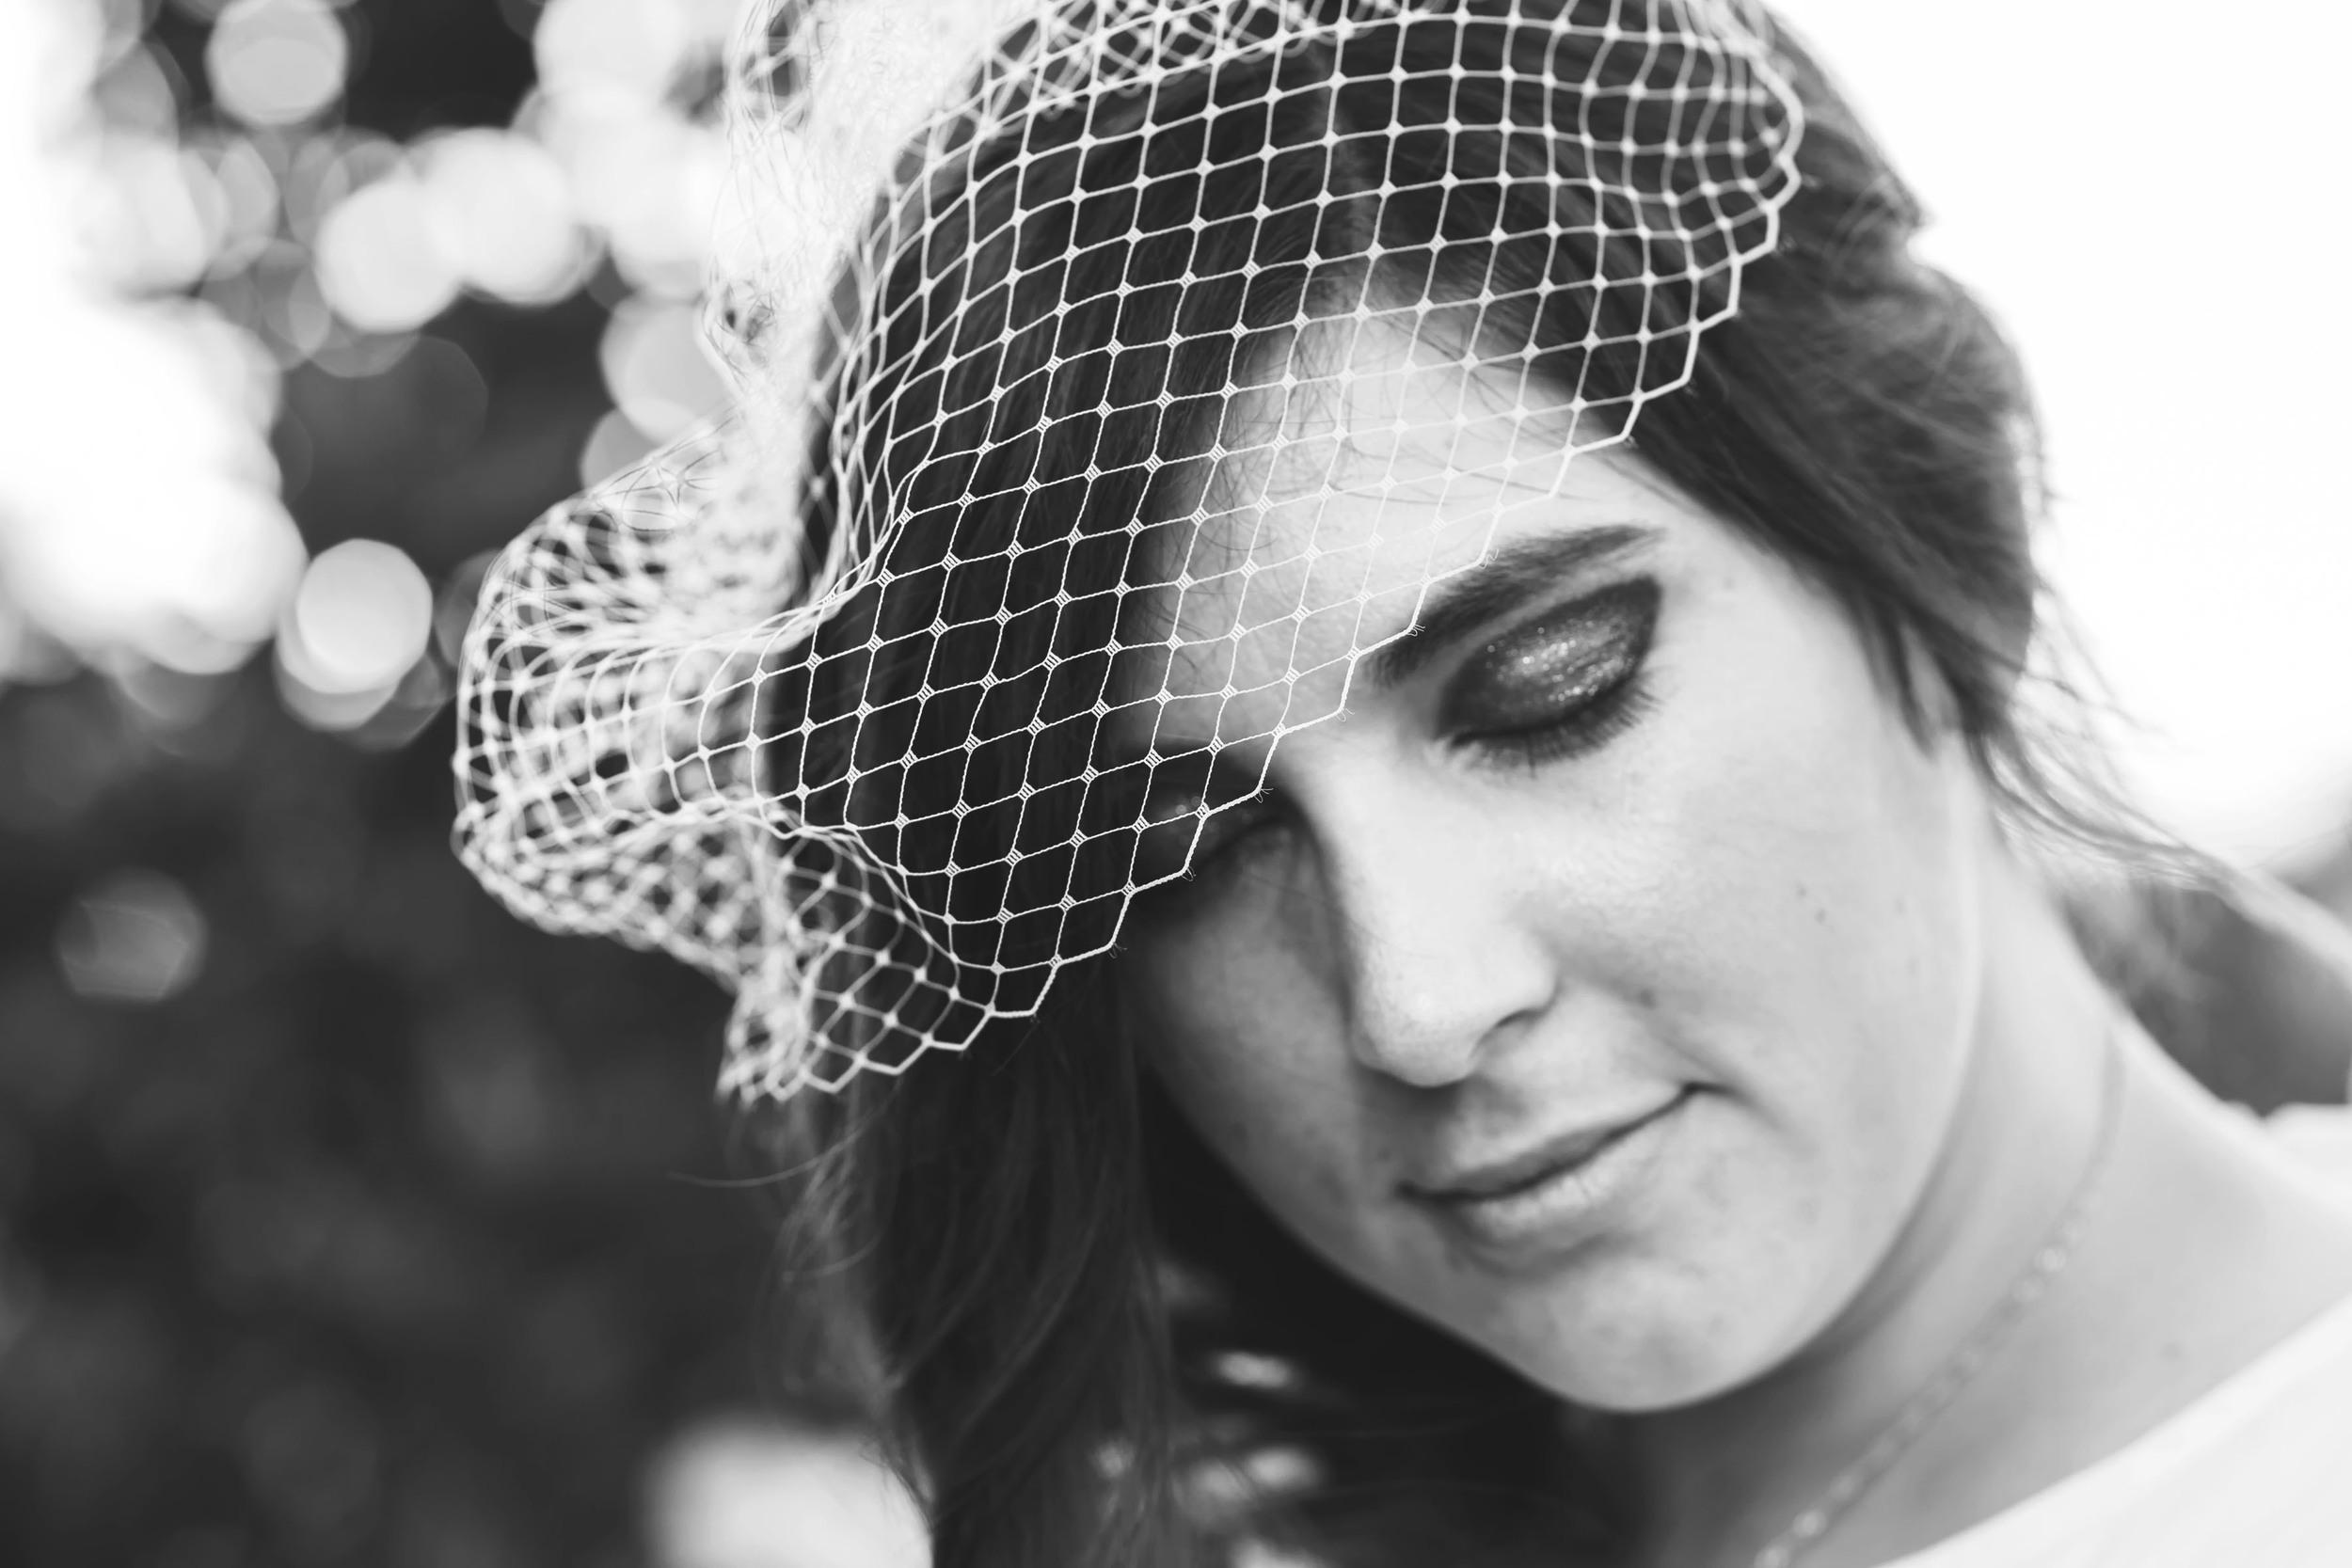 NC_Wedding_Photographer_Tiffany_Abruzzo_Photography_51.jpg